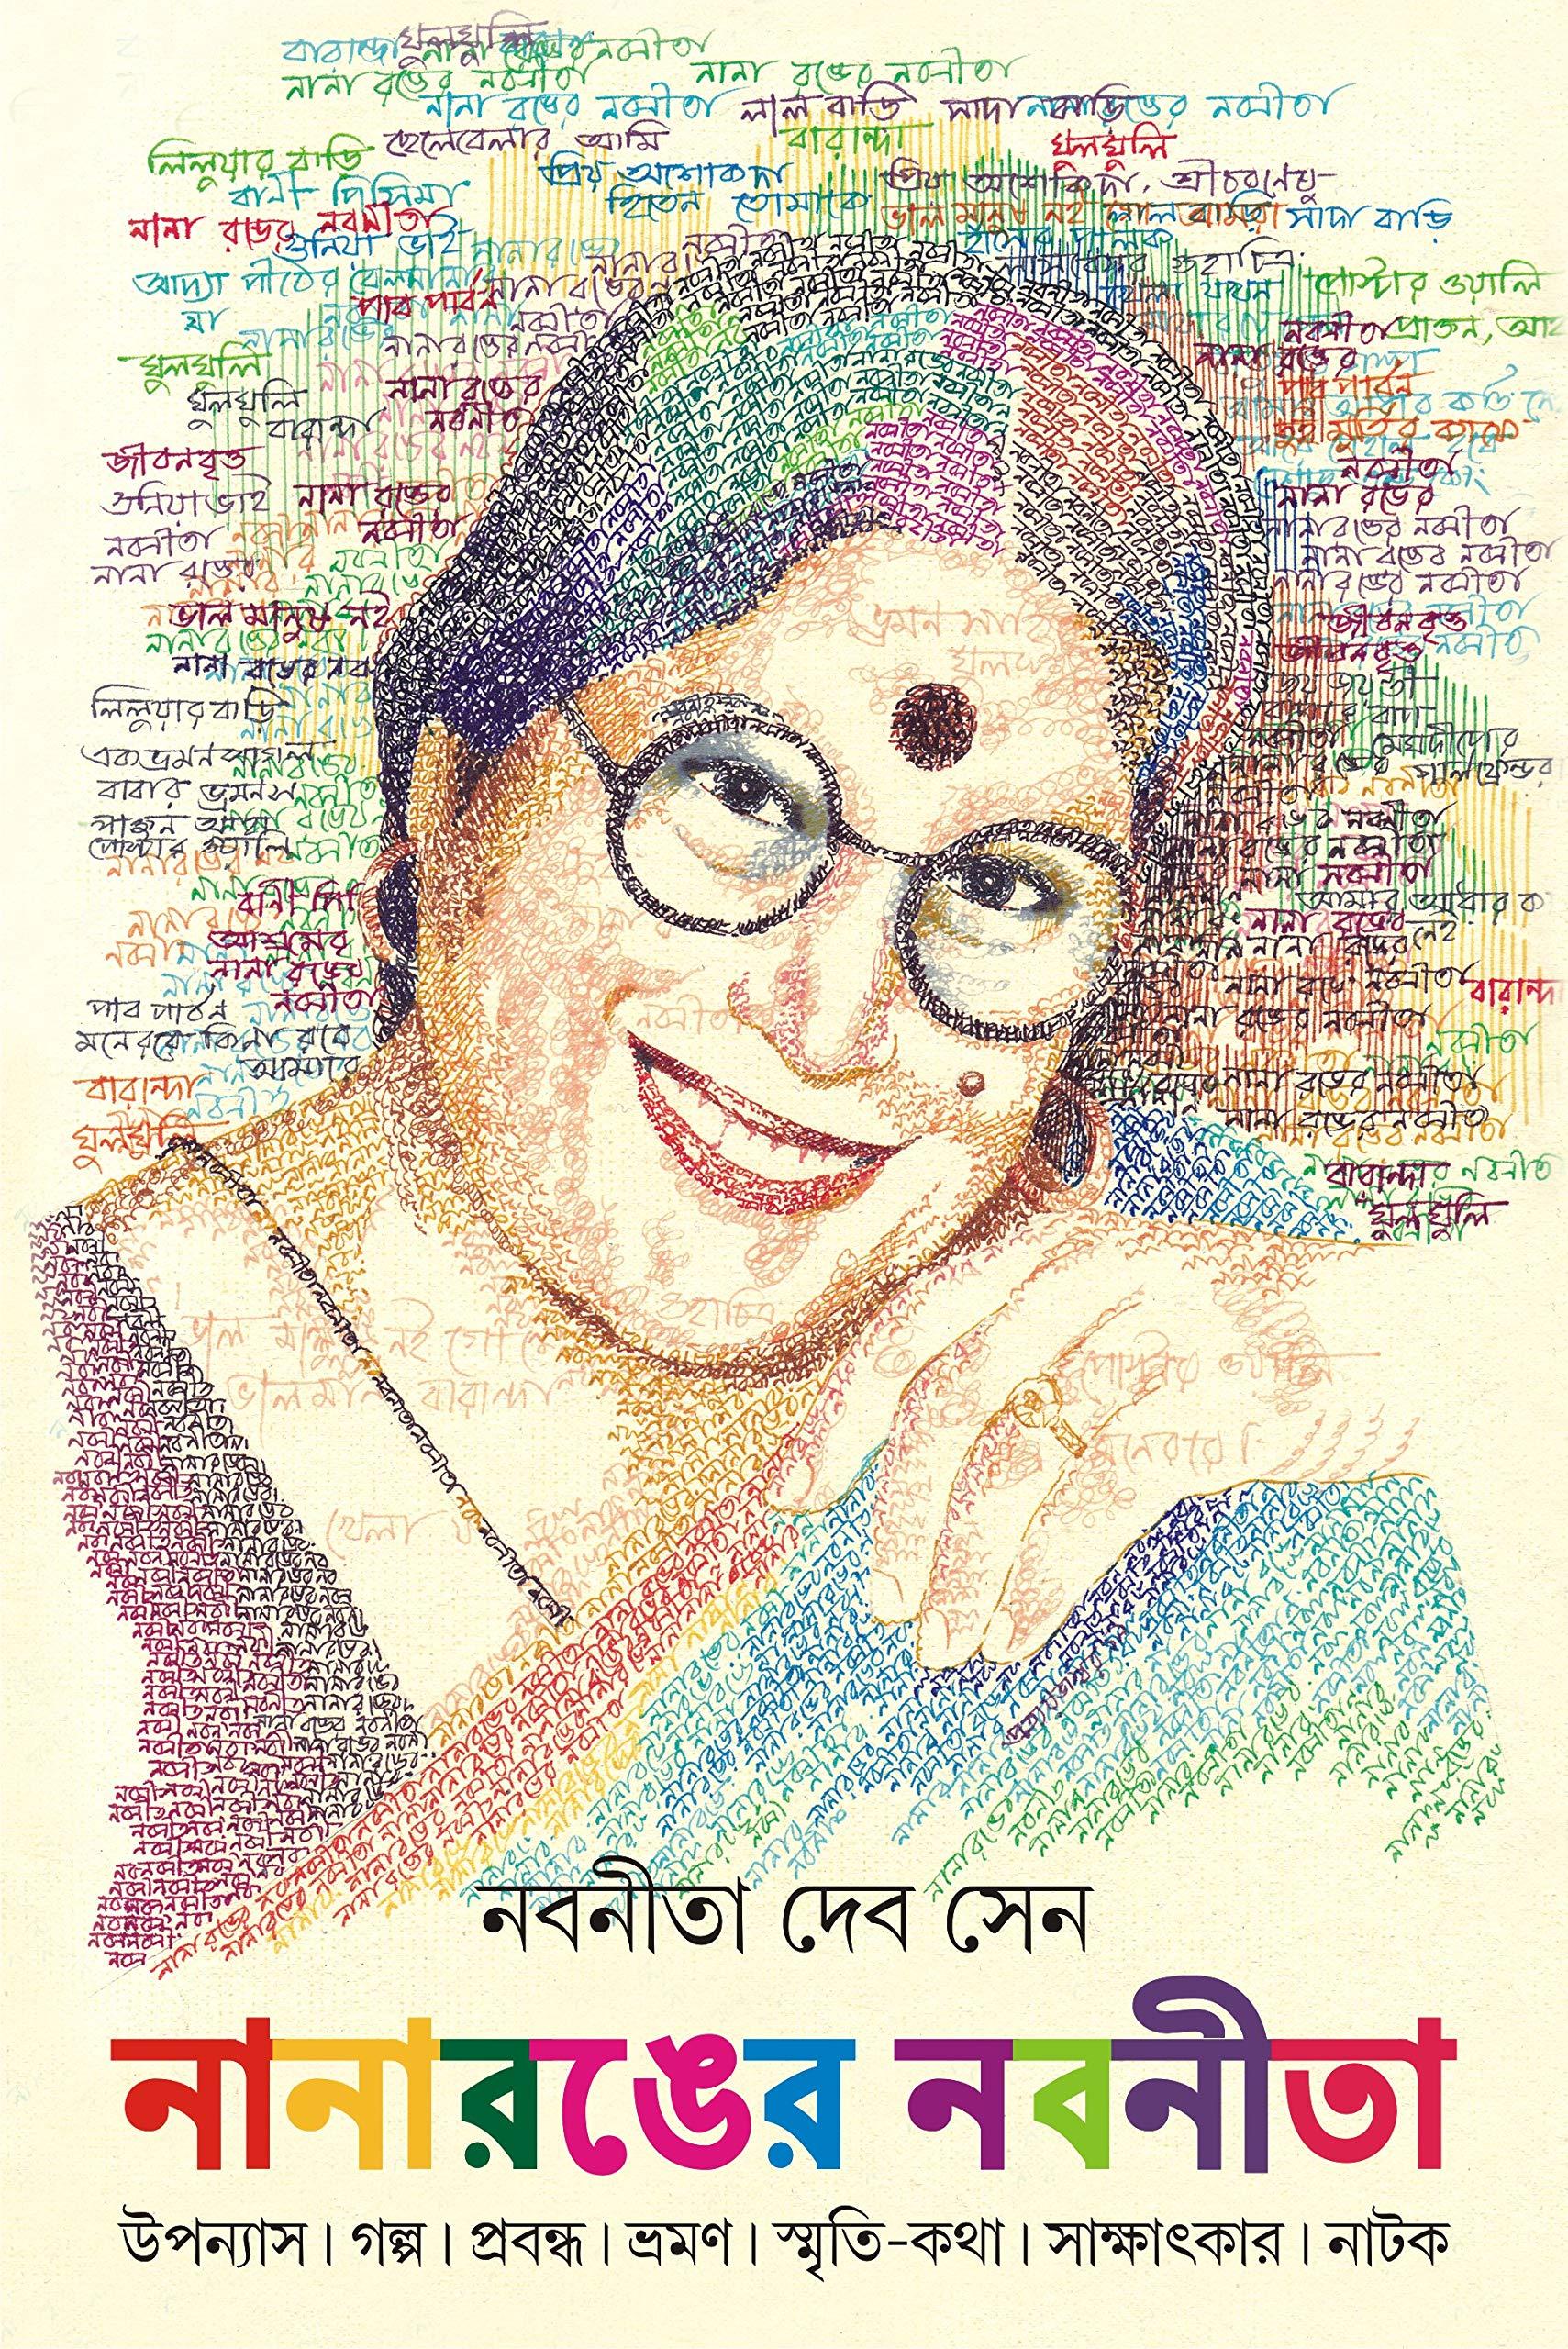 NANARONGER NABANEETA Nabanita Devsen Bengali Collection Bangla Samagra Rare Novel Stories Essays Travelogues Memoirs Upanyas [Hardcover] NABANEETA DEB SEN